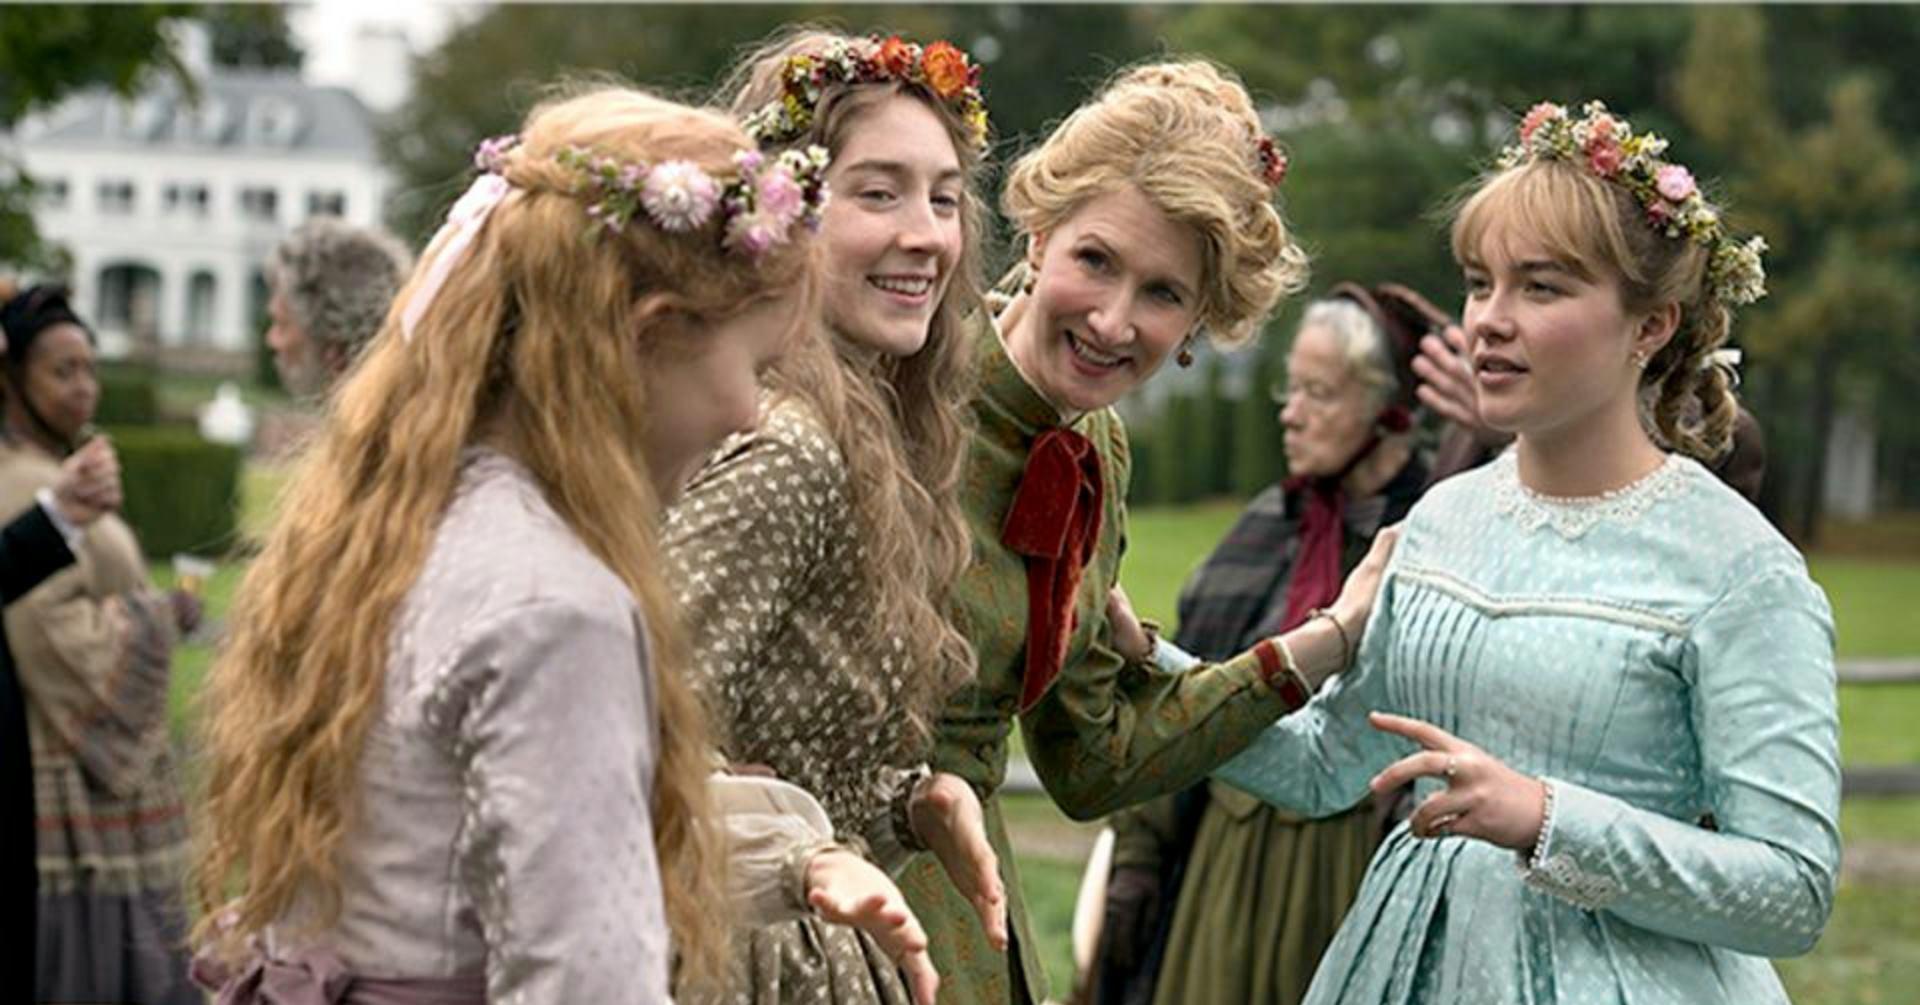 Tuesday 18.08.20 – 20:45 I Little Women I Open Air Kino on the Island